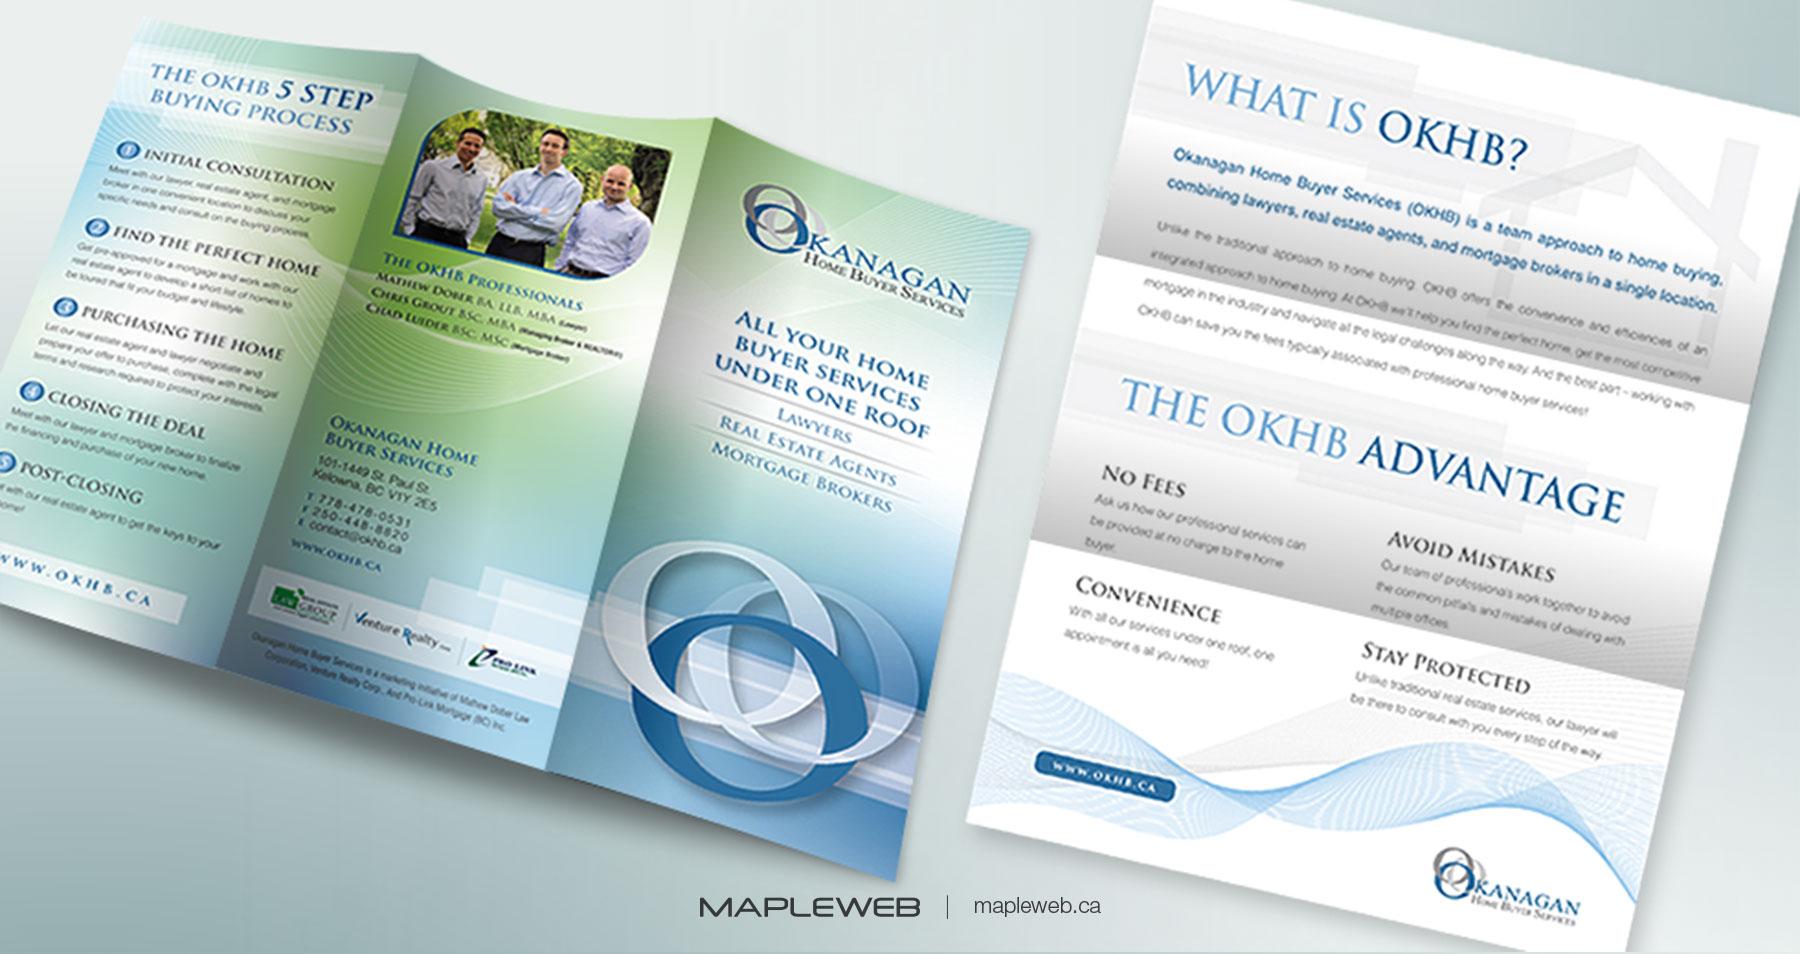 Okanagan Home Buyer Services